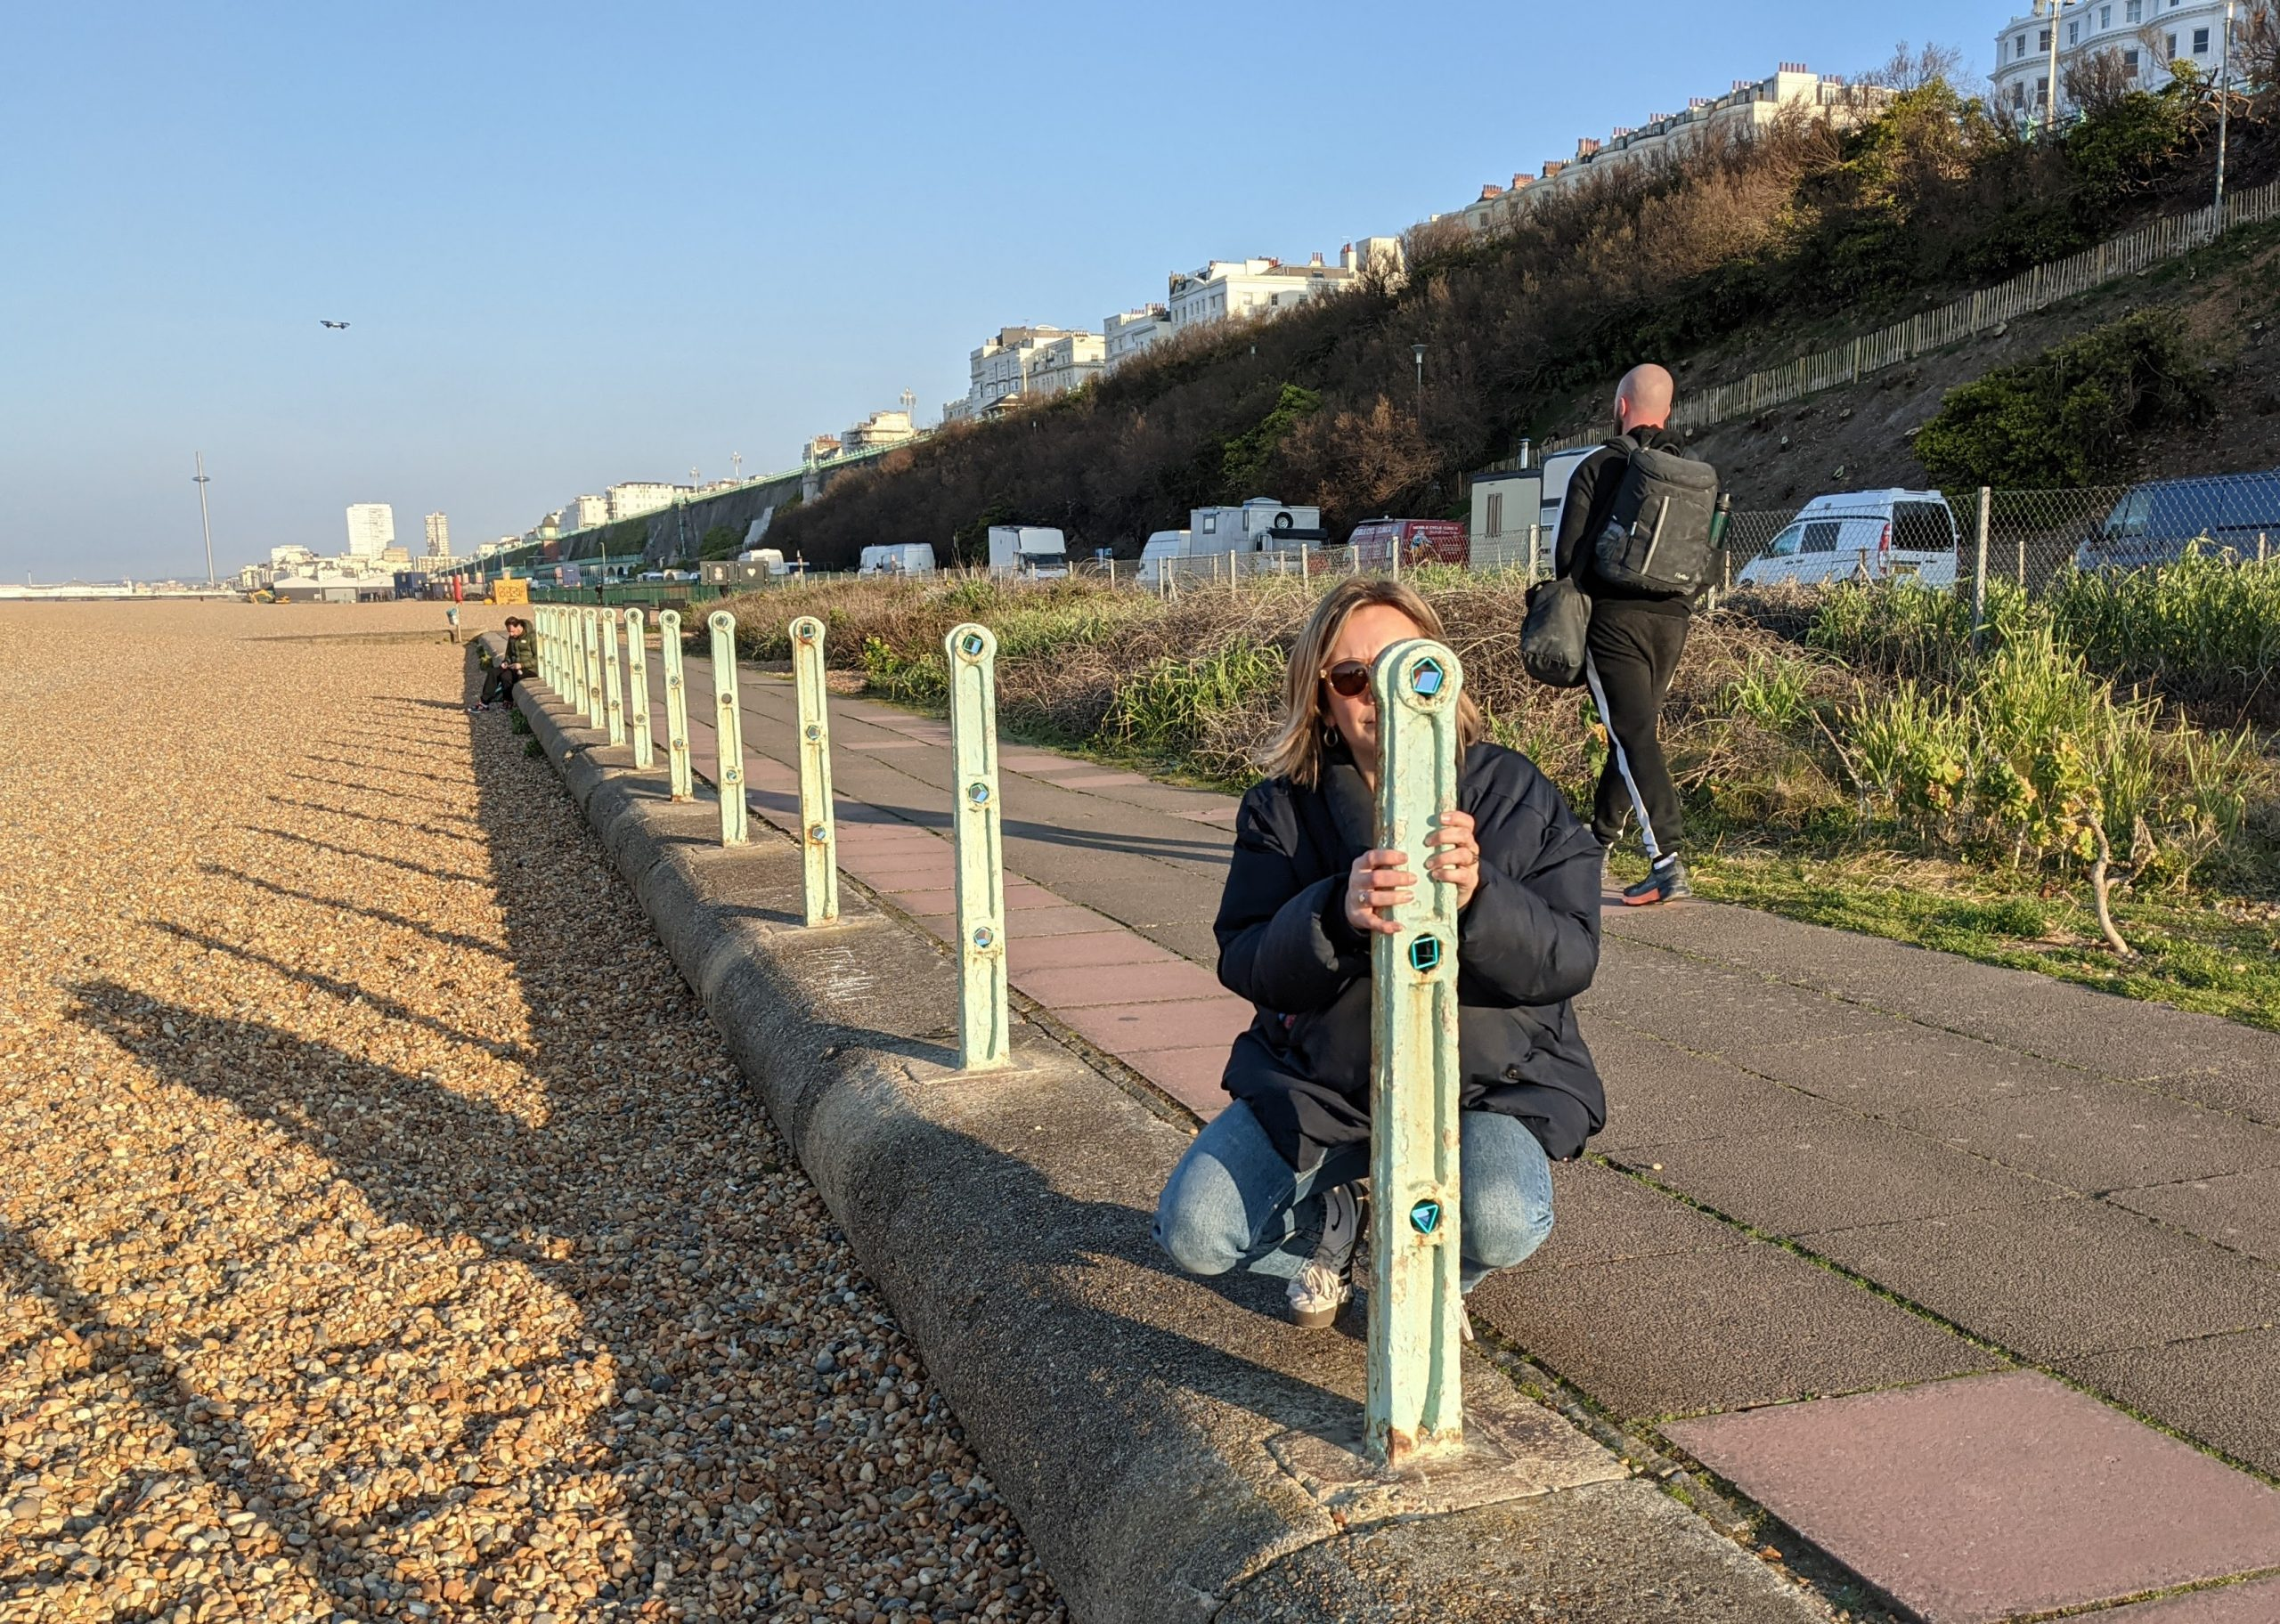 Peeping - image of sculptural installation at Black Rock, Brighton, UK